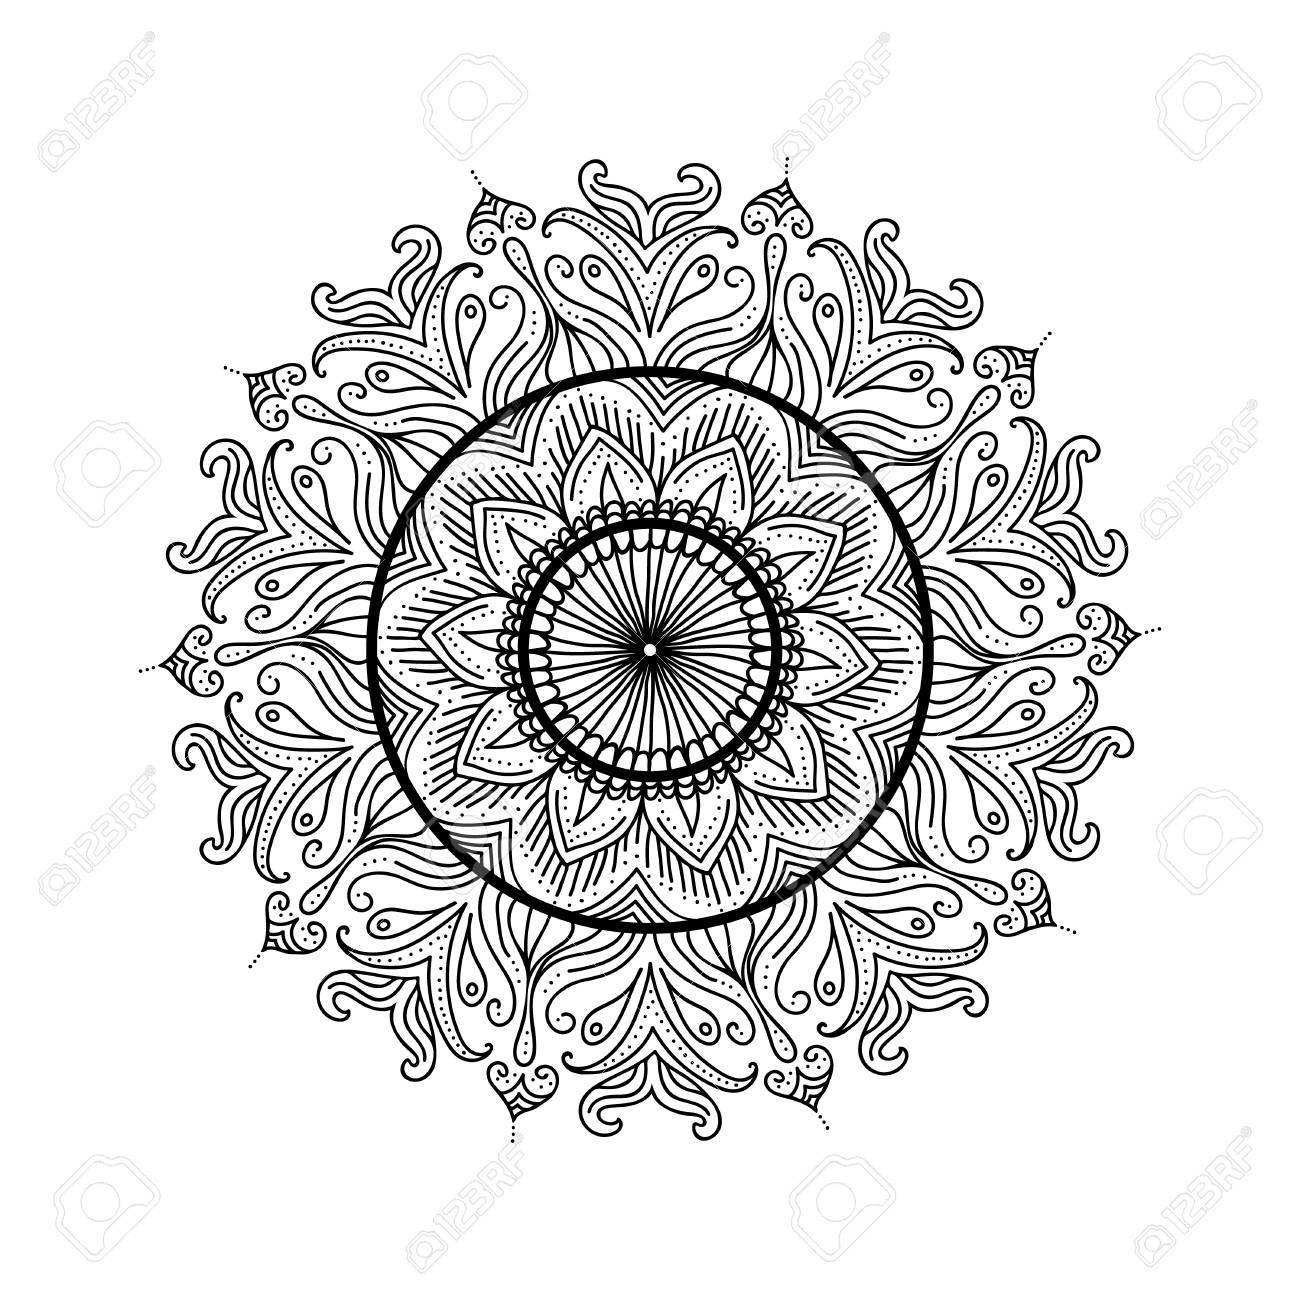 Beautiful Mandala Abstract Ornamental Vintage Coloring Page Template Vector Illustration Stock